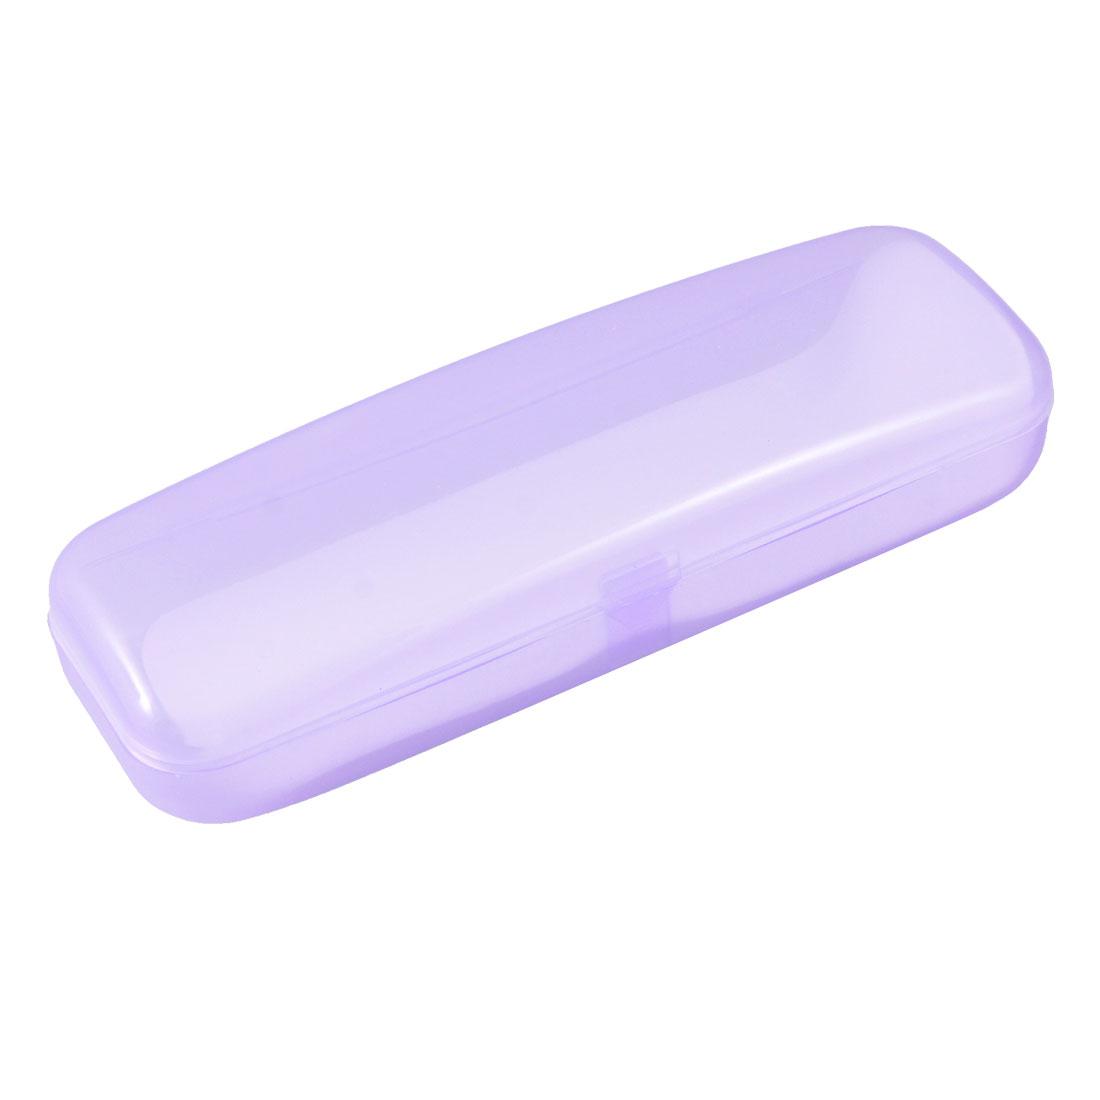 Carriable Clear Purple Plastic Rectangular Plain Glasses Eyeglasses Case Storage